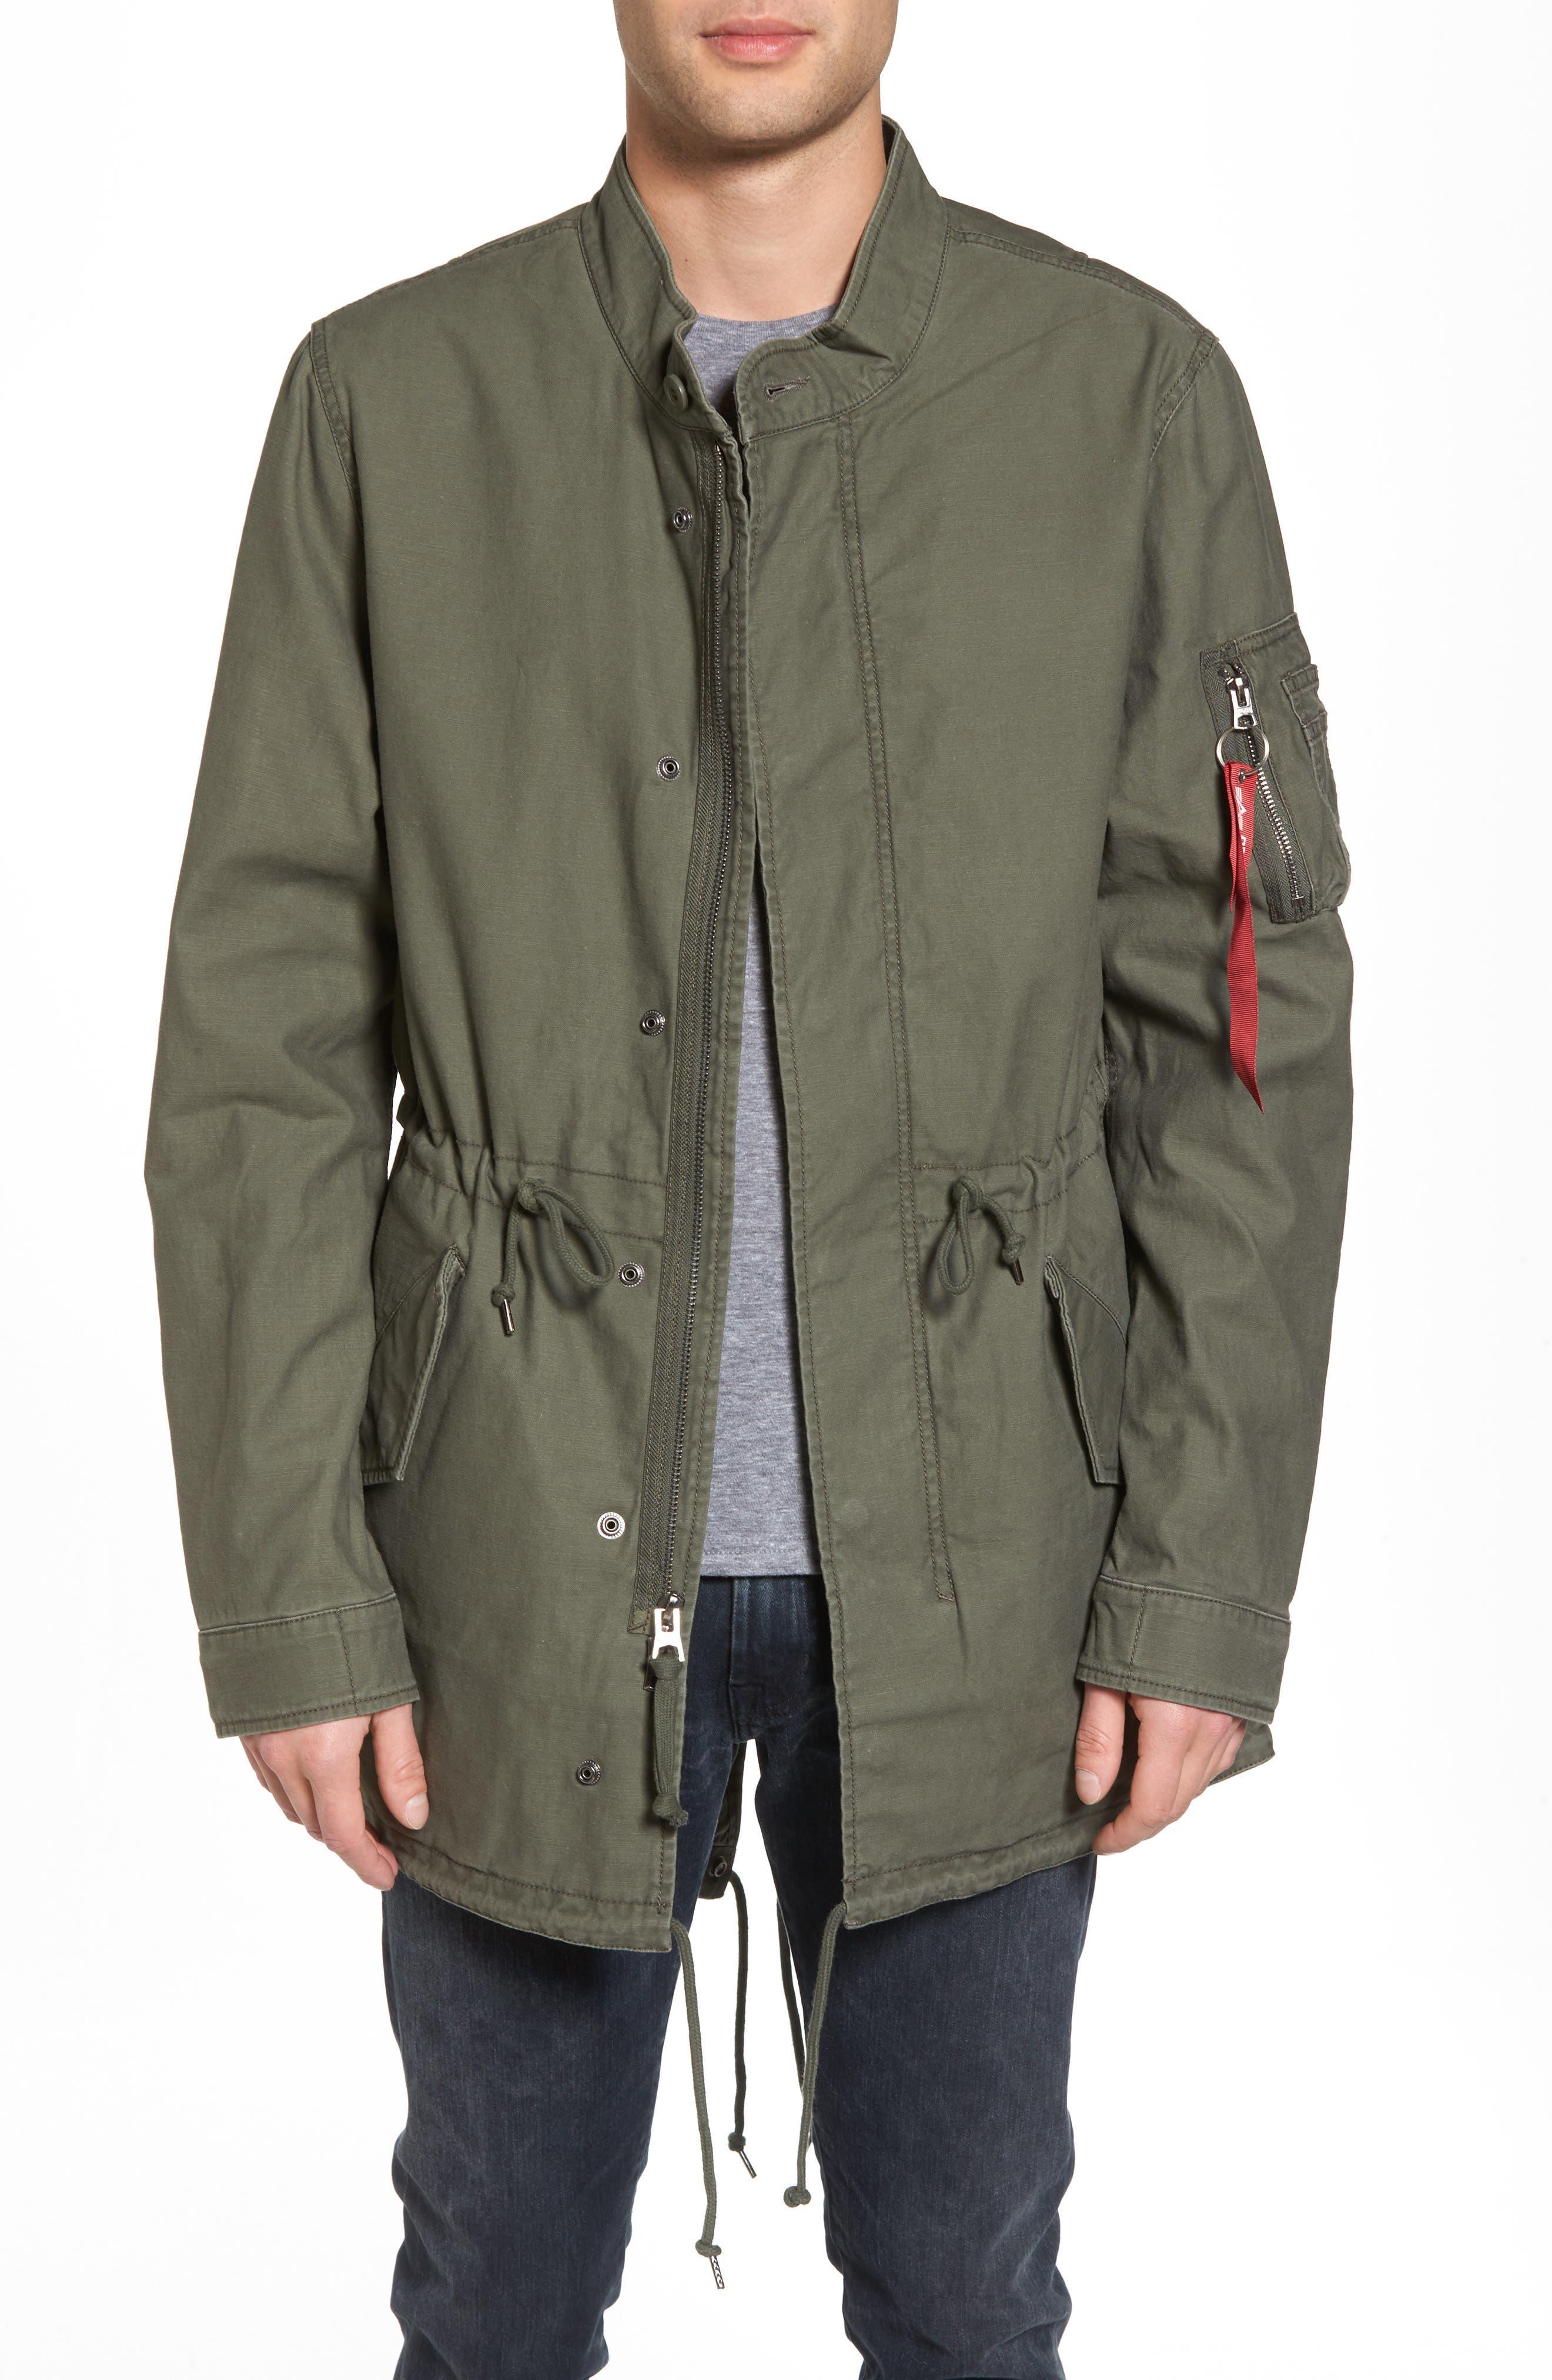 Recruit Fishtail Jacket,                         Main,                         color, M-65 Olive